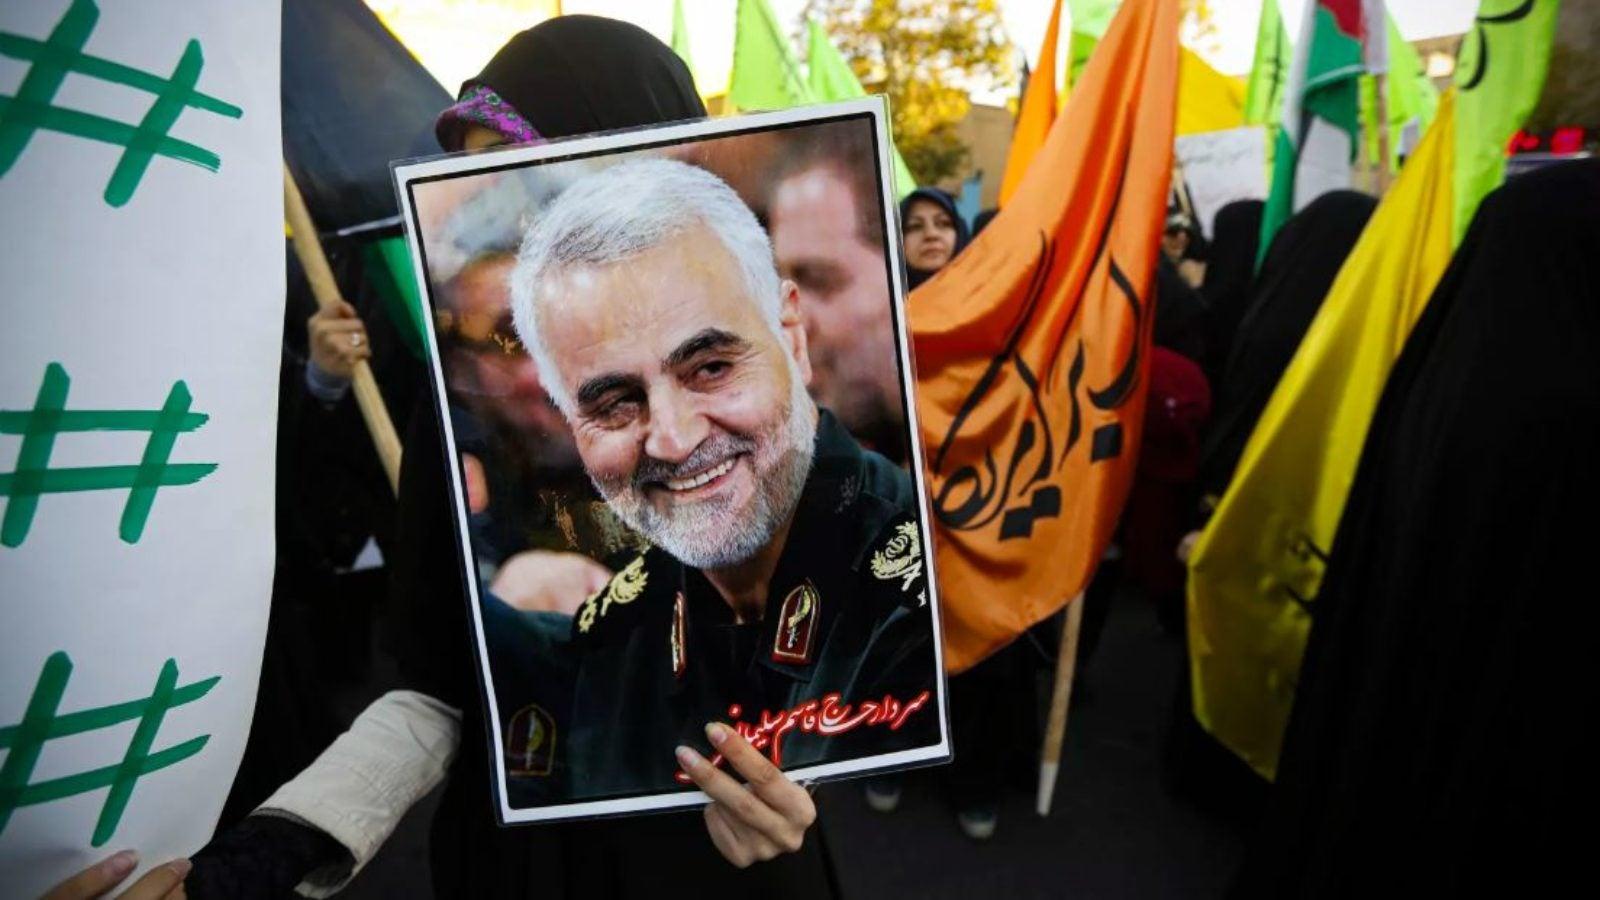 Iranian protesters hold a photo of Maj. Gen. Qassem Suleimani